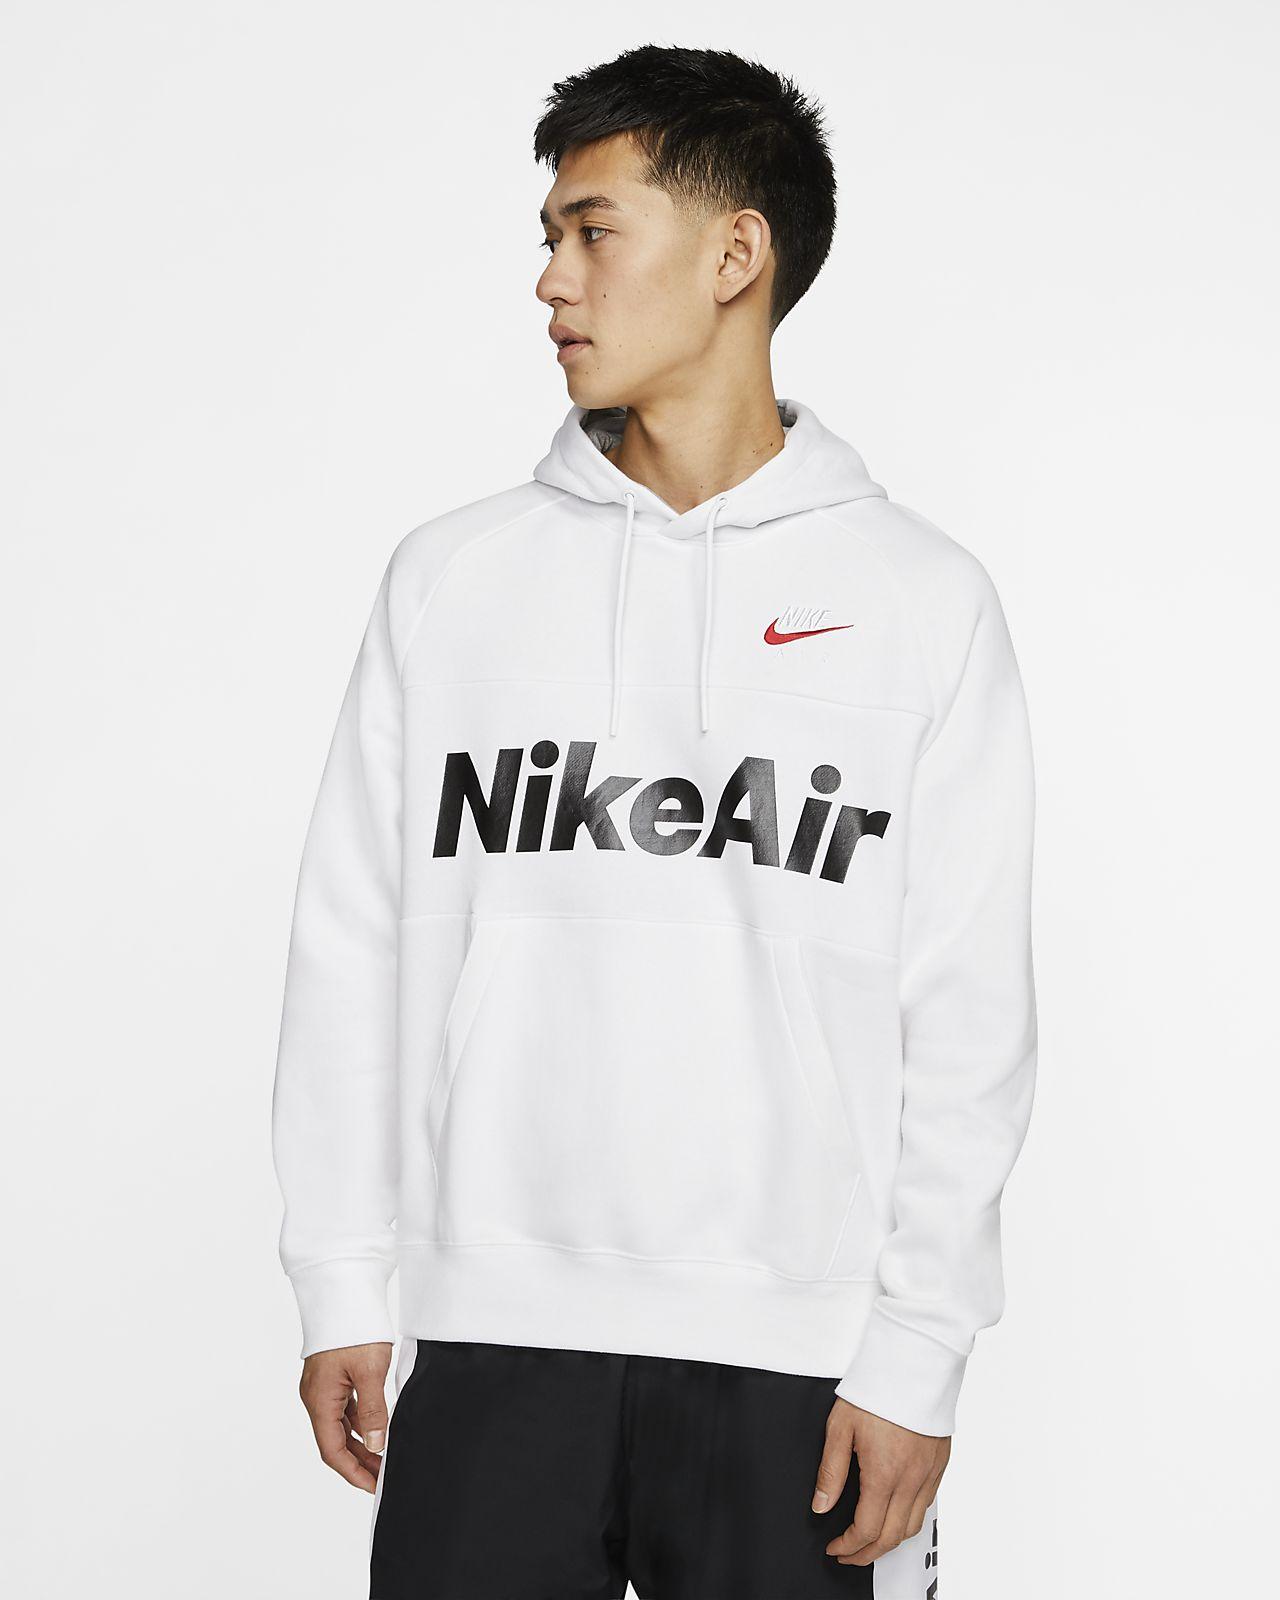 Nike Air Fleece-Hoodie für Herren